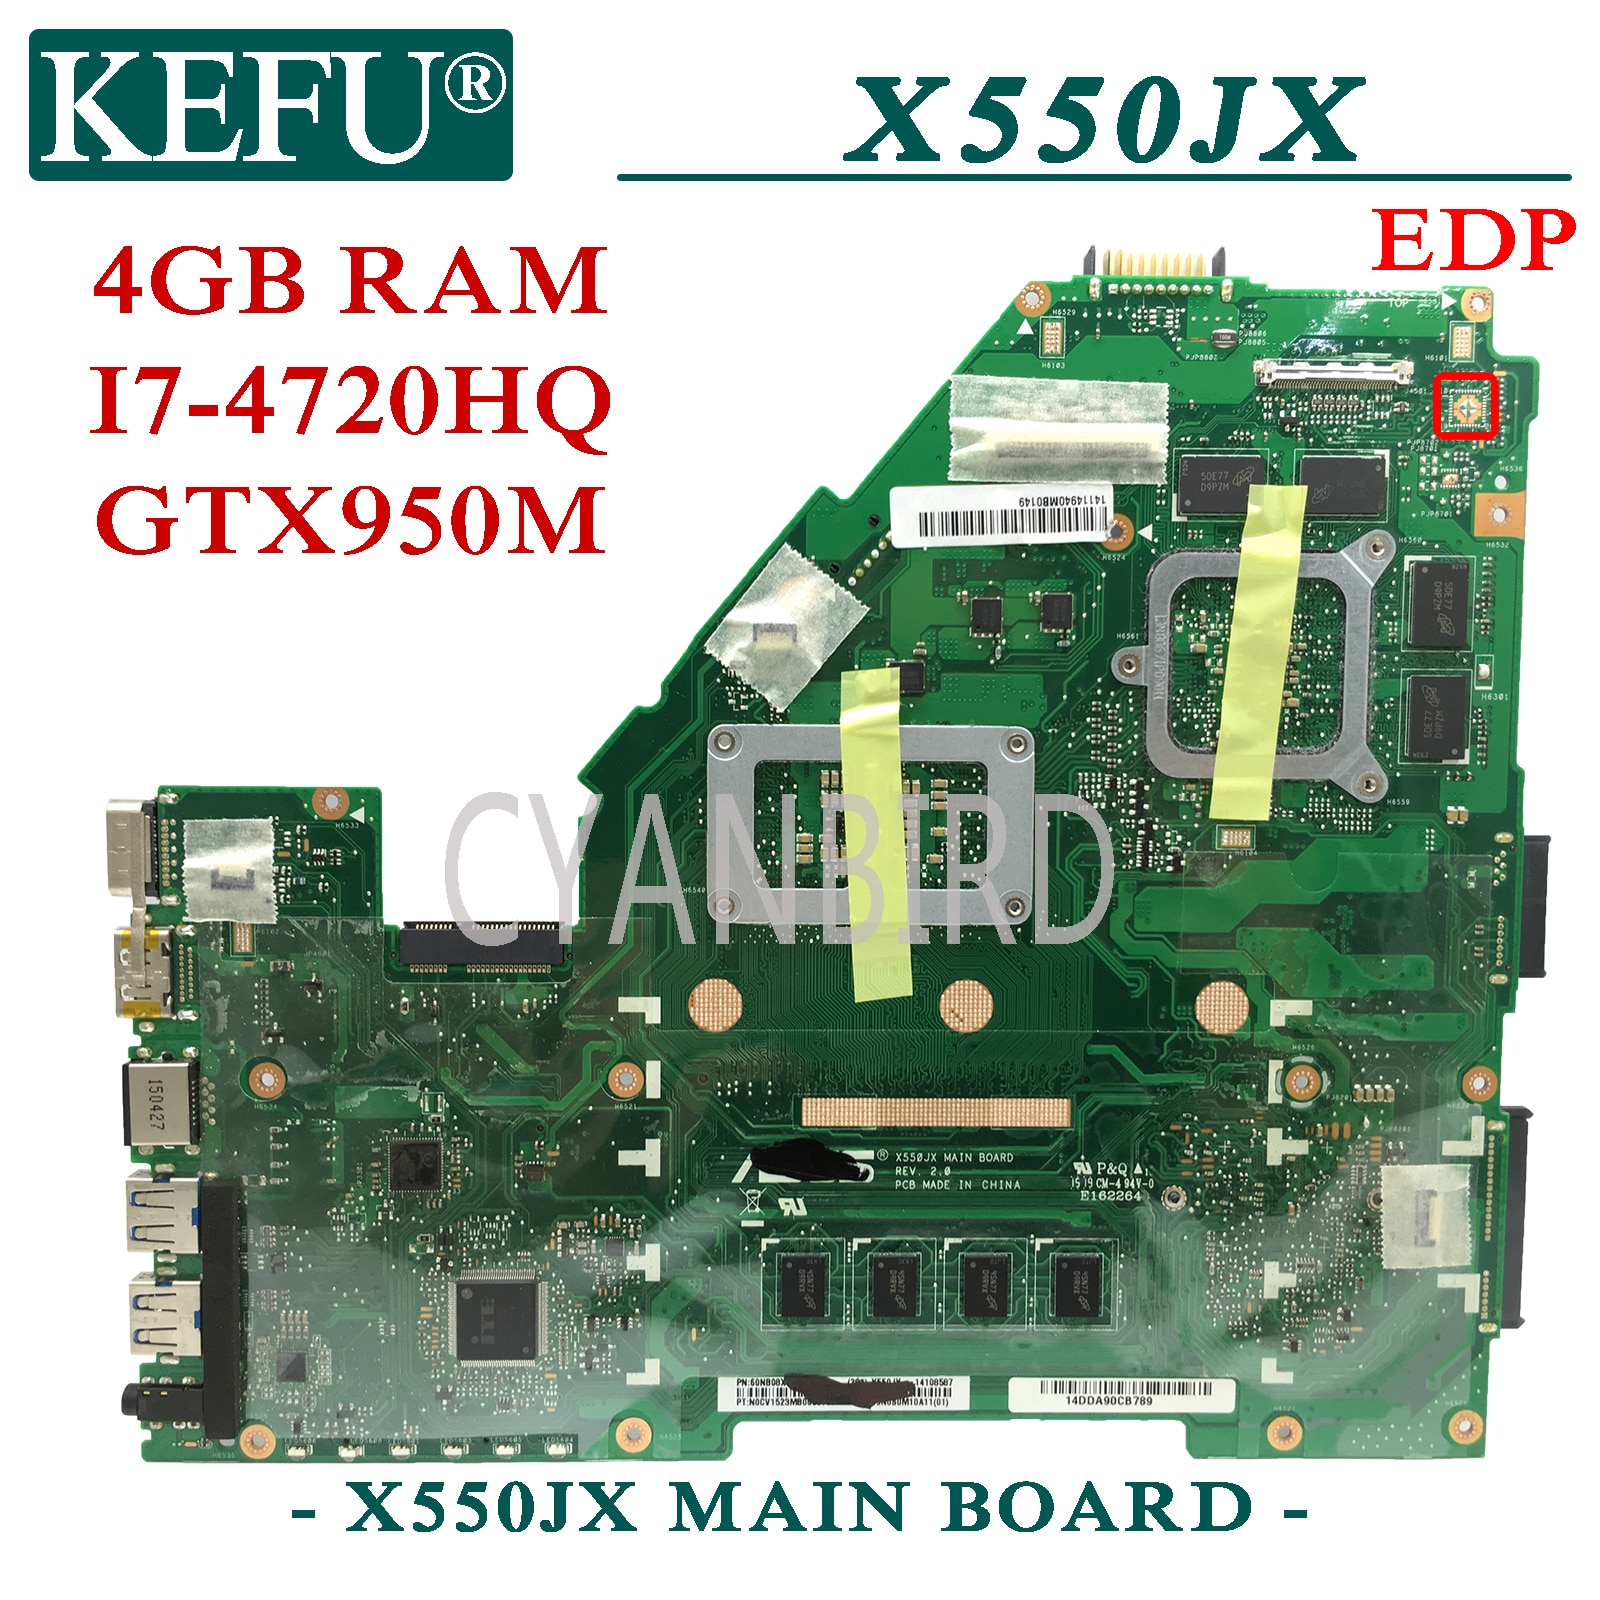 KEFU X550JX الأصلي اللوحة الرئيسية ل ASUS X550JX X550JF X550JK X550JD X550J مع I7-4720HQ GTX950M EDP اللوحة الأم للكمبيوتر المحمول